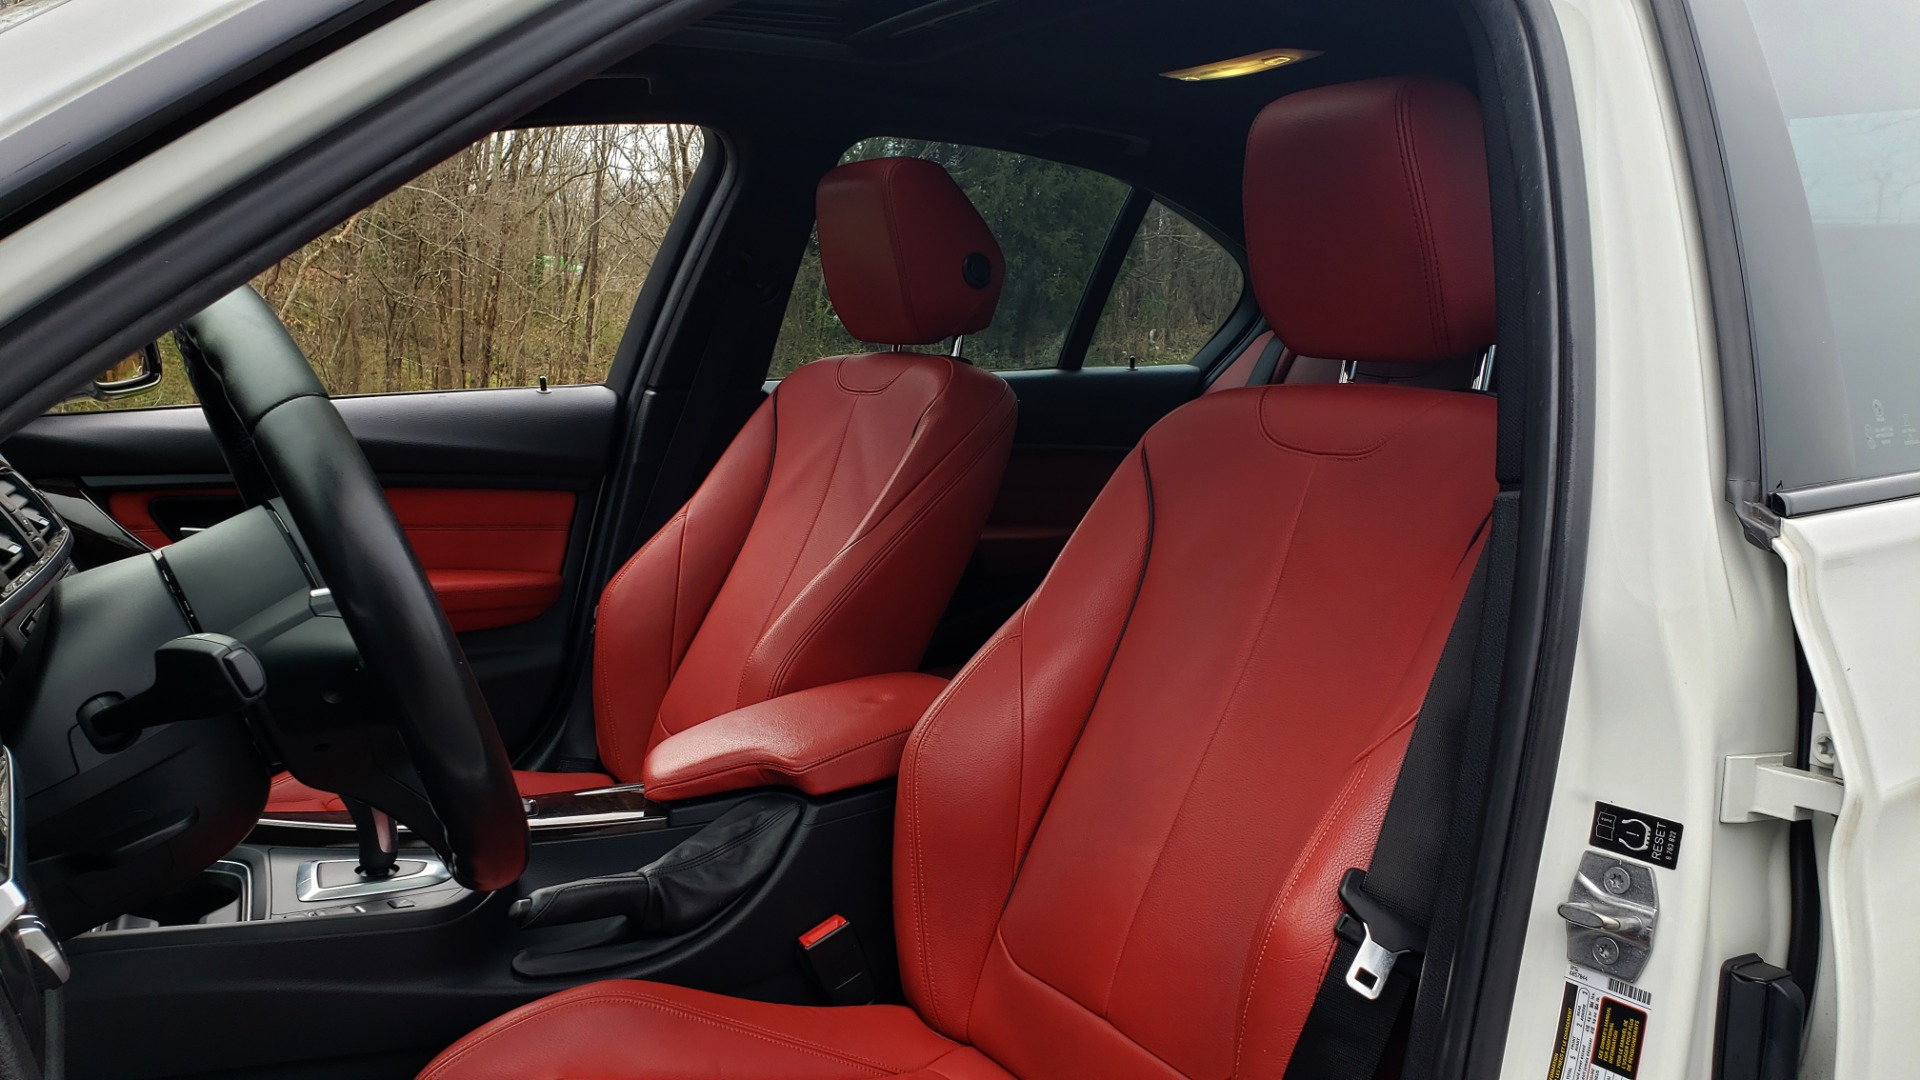 Used 2015 BMW 3 Series 335I M-SPORT / PREM PKG / HK SND / SUNROOF / REARVIEW for sale Sold at Formula Imports in Charlotte NC 28227 37